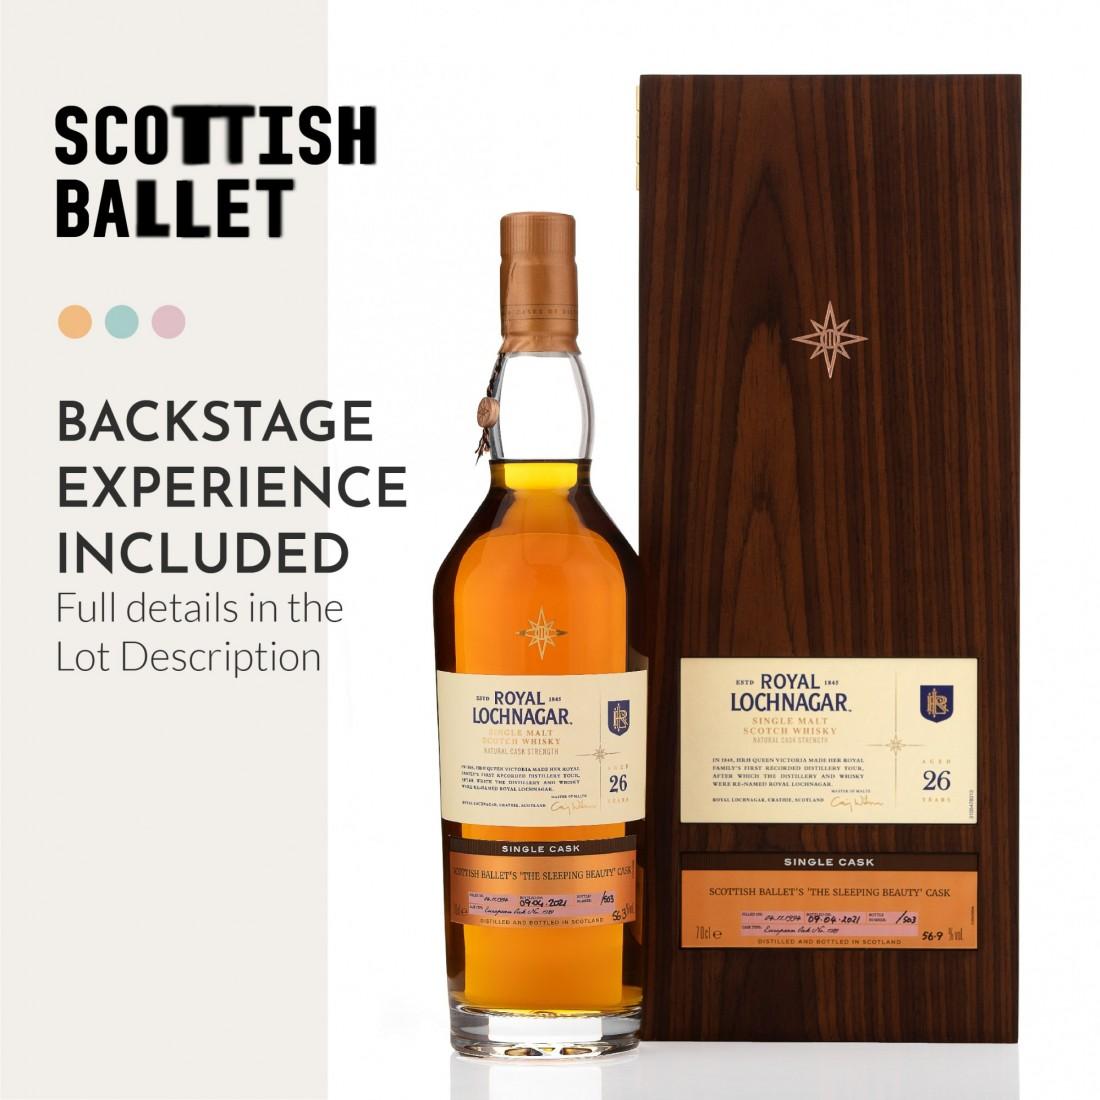 Royal Lochnagar 1994 Casks of Distinction 26 Year Old #1289 / Bottle #004